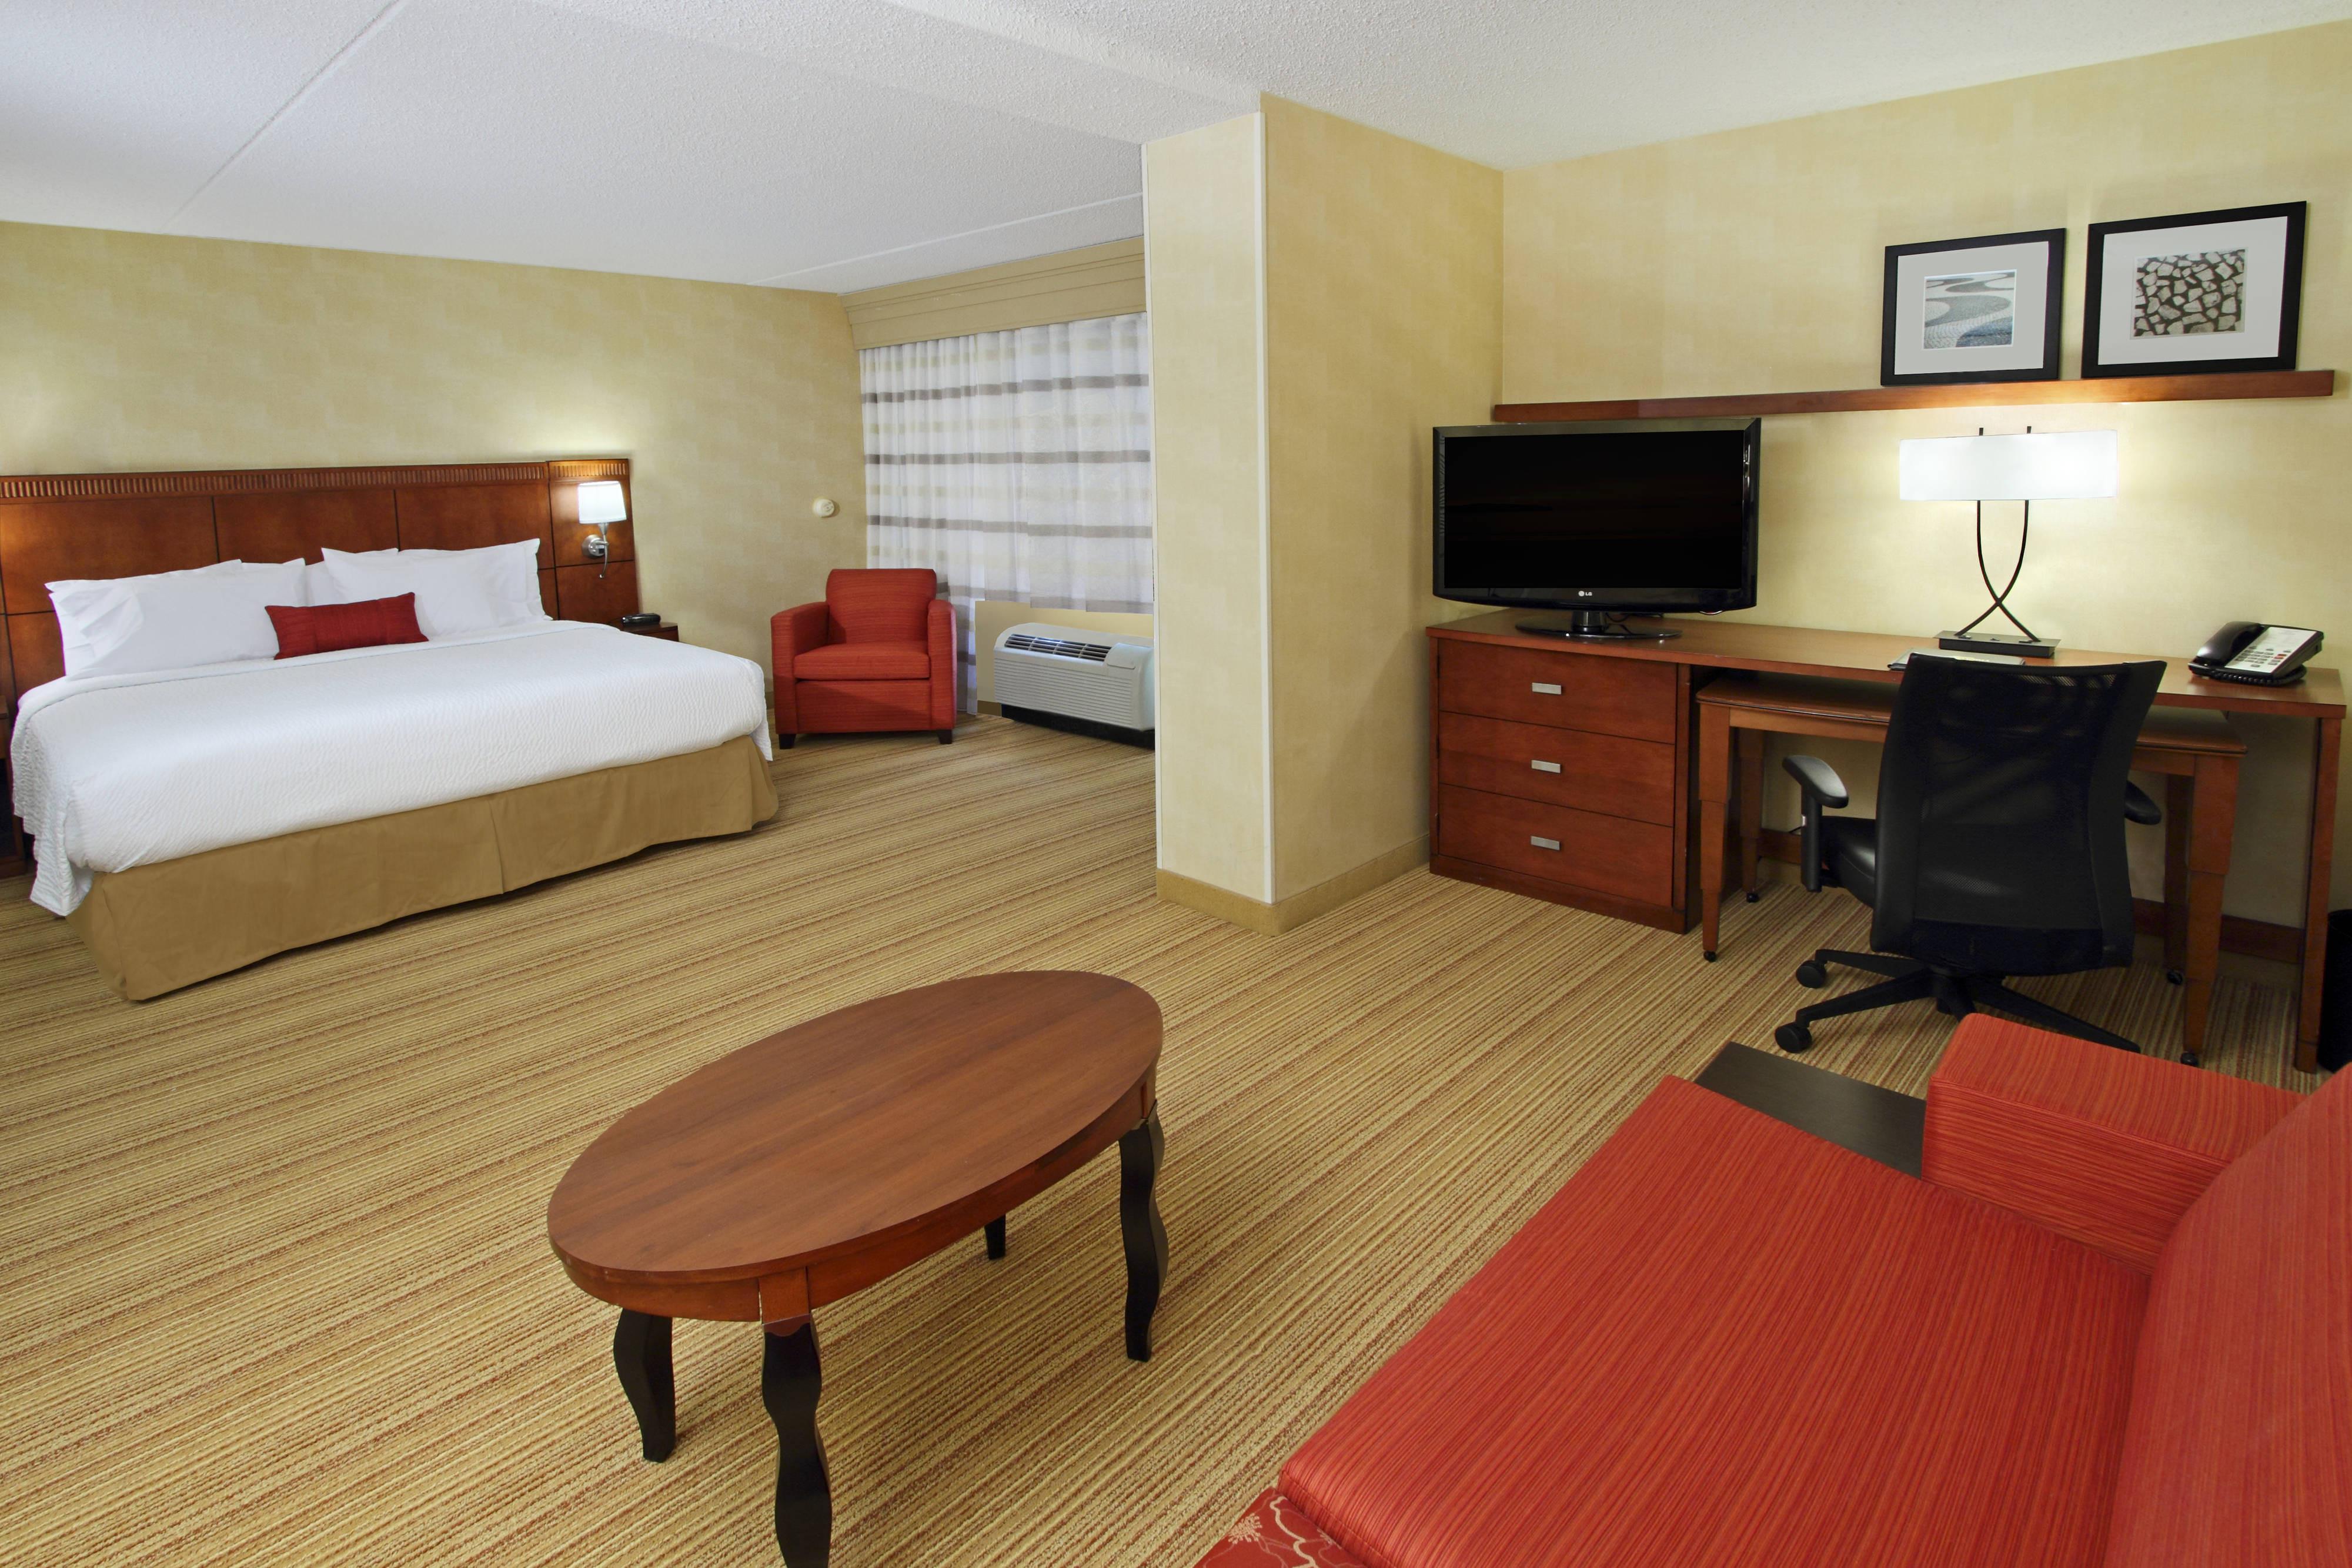 boardwalk hardwood floors st louis of courtyard rockaway mt arlington rockaway nj hotels in mt arlington within king suite